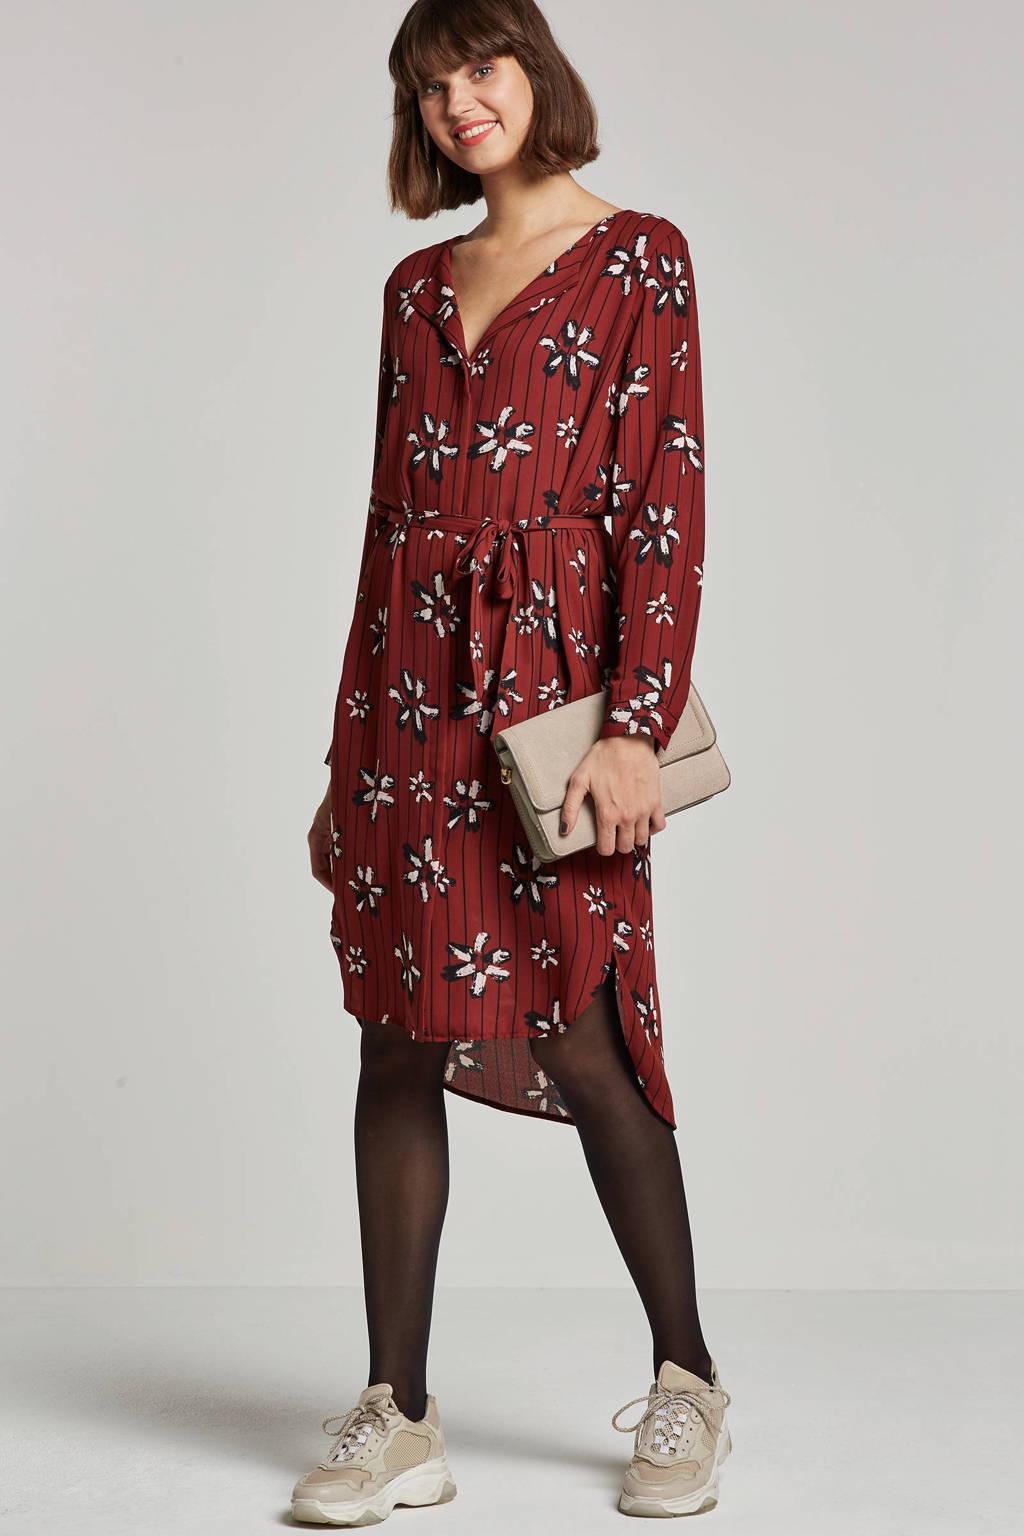 SELECTED FEMME gebloemde blousejurk, bruin/zwart/wit